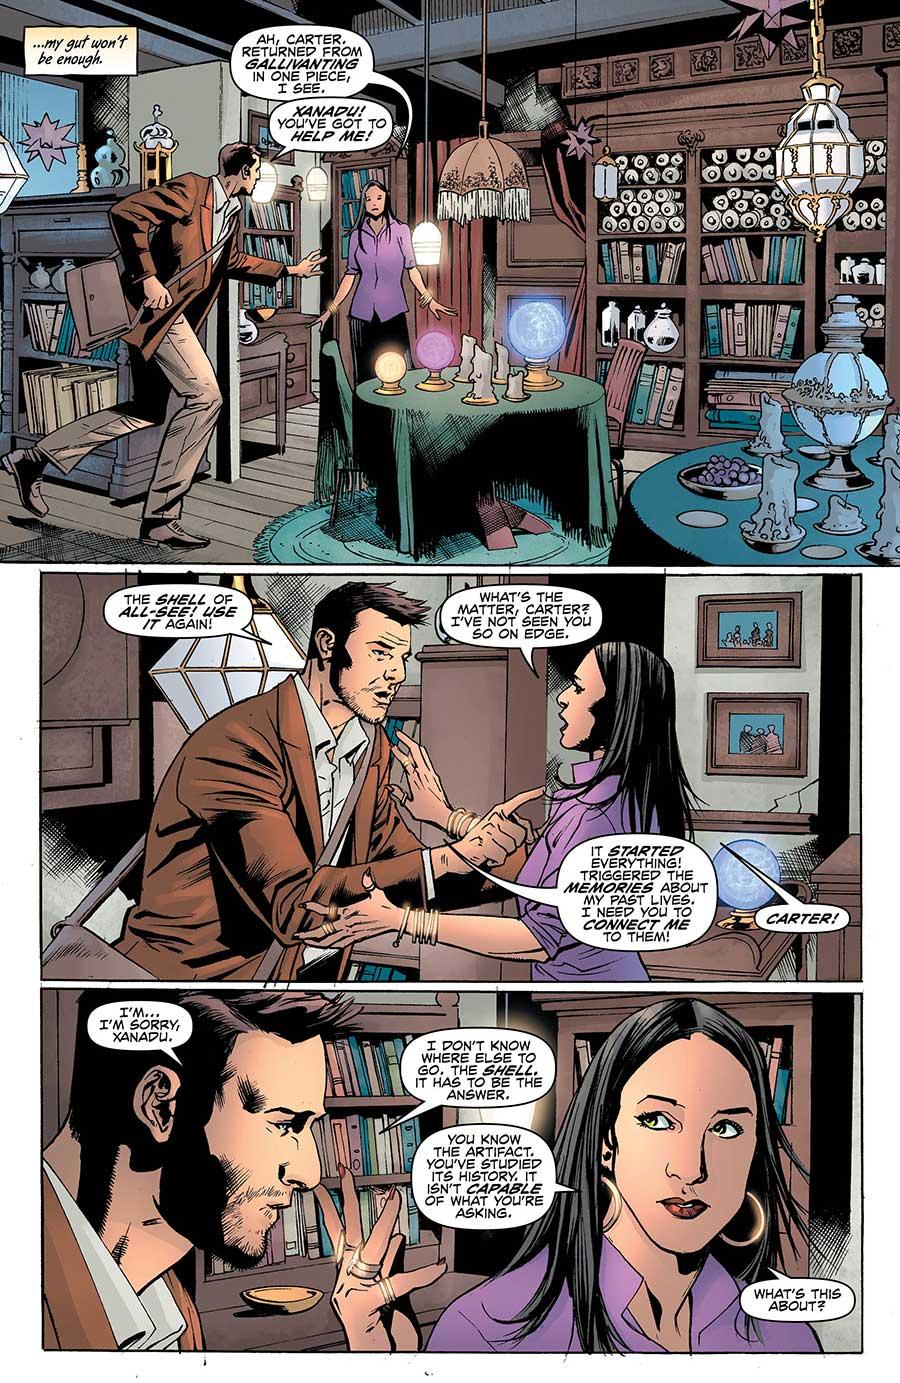 Hawkman 9_2 - DC Comics News